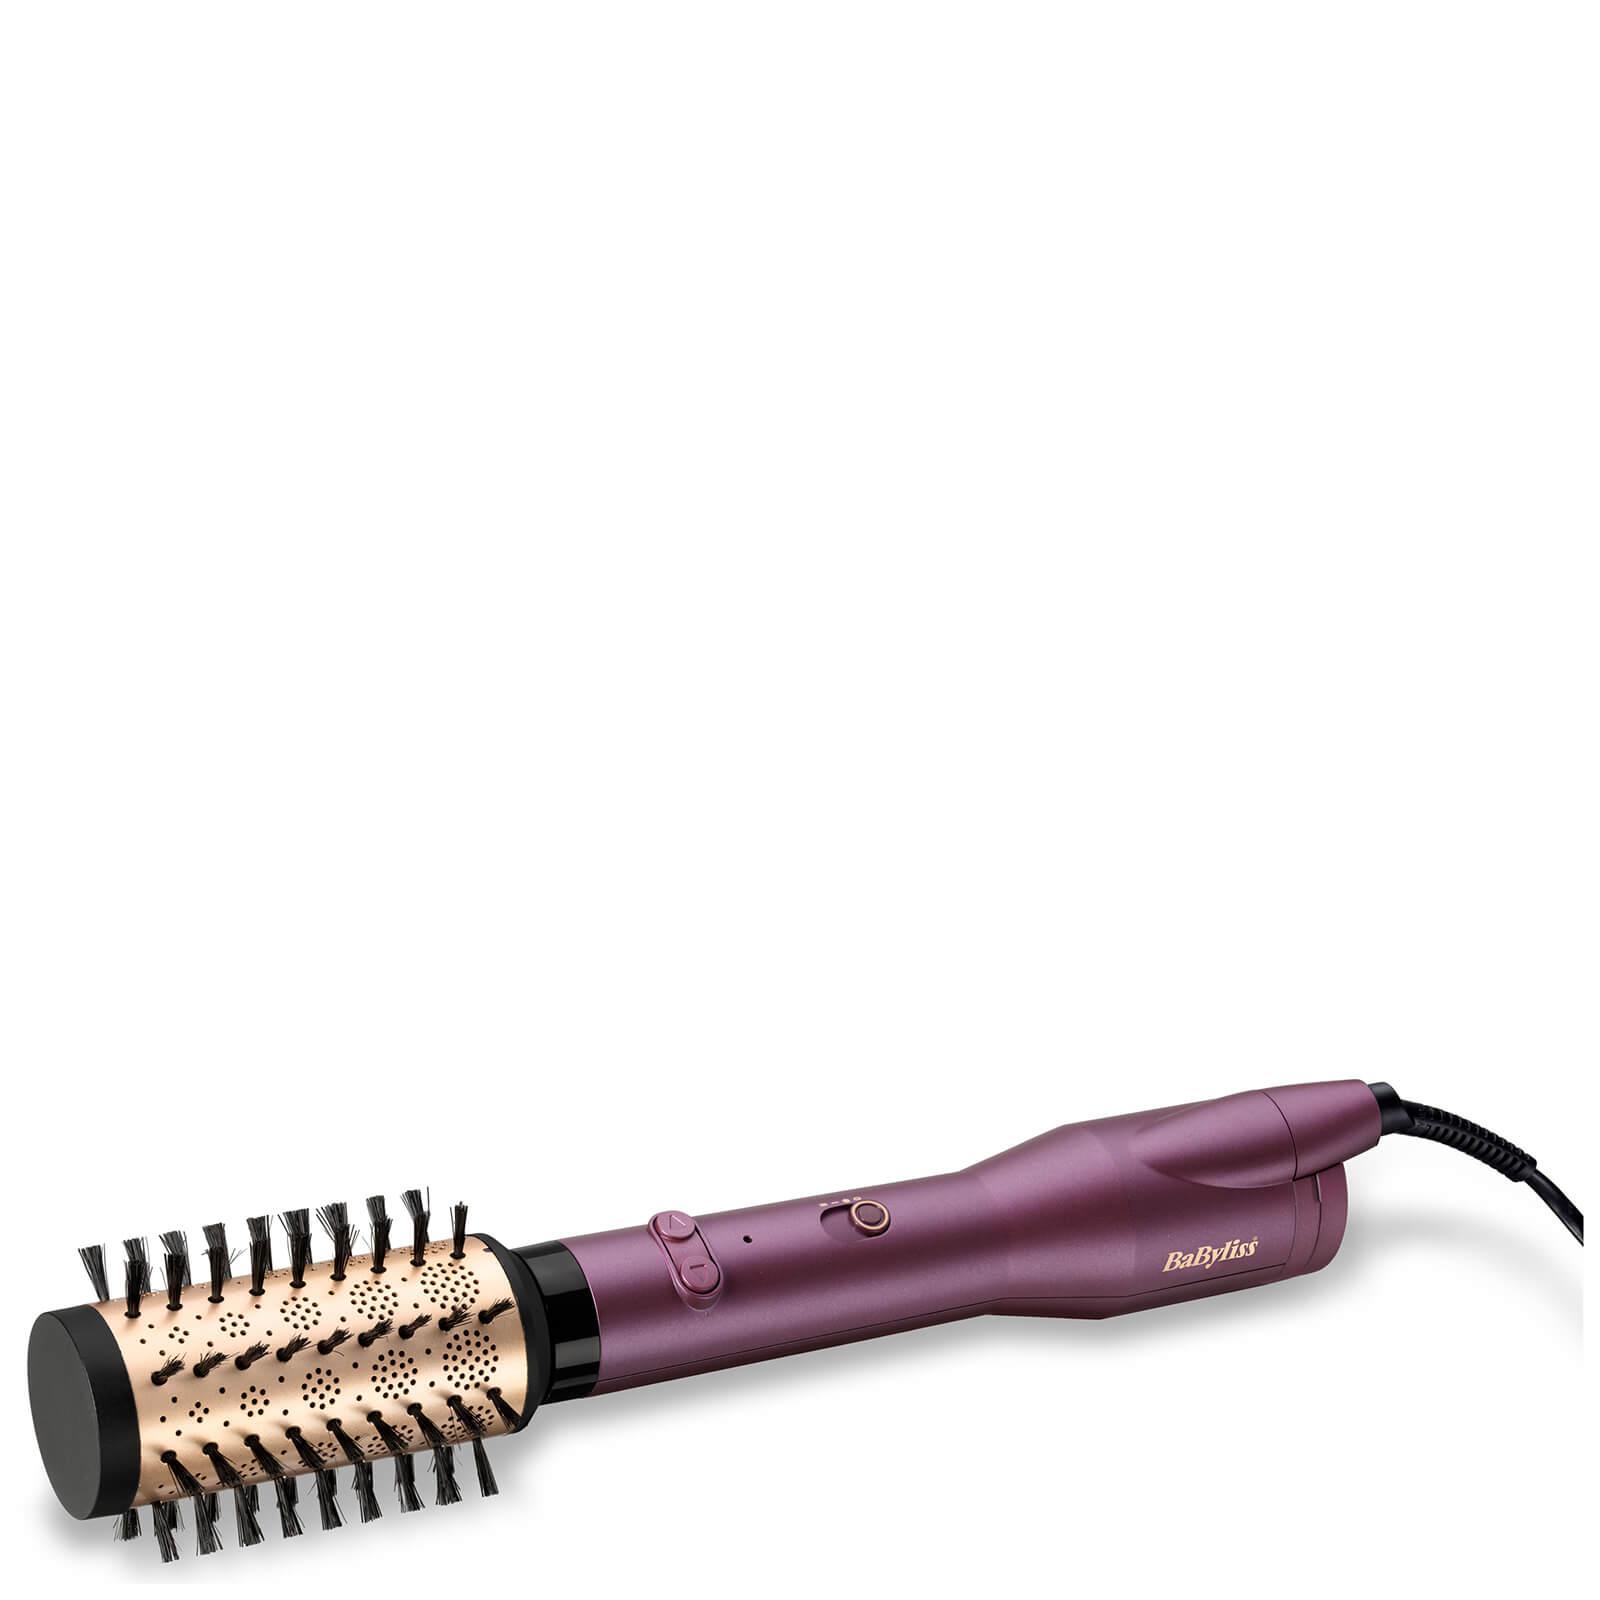 BaByliss Brosse chauffante Big Hair Care BaByliss